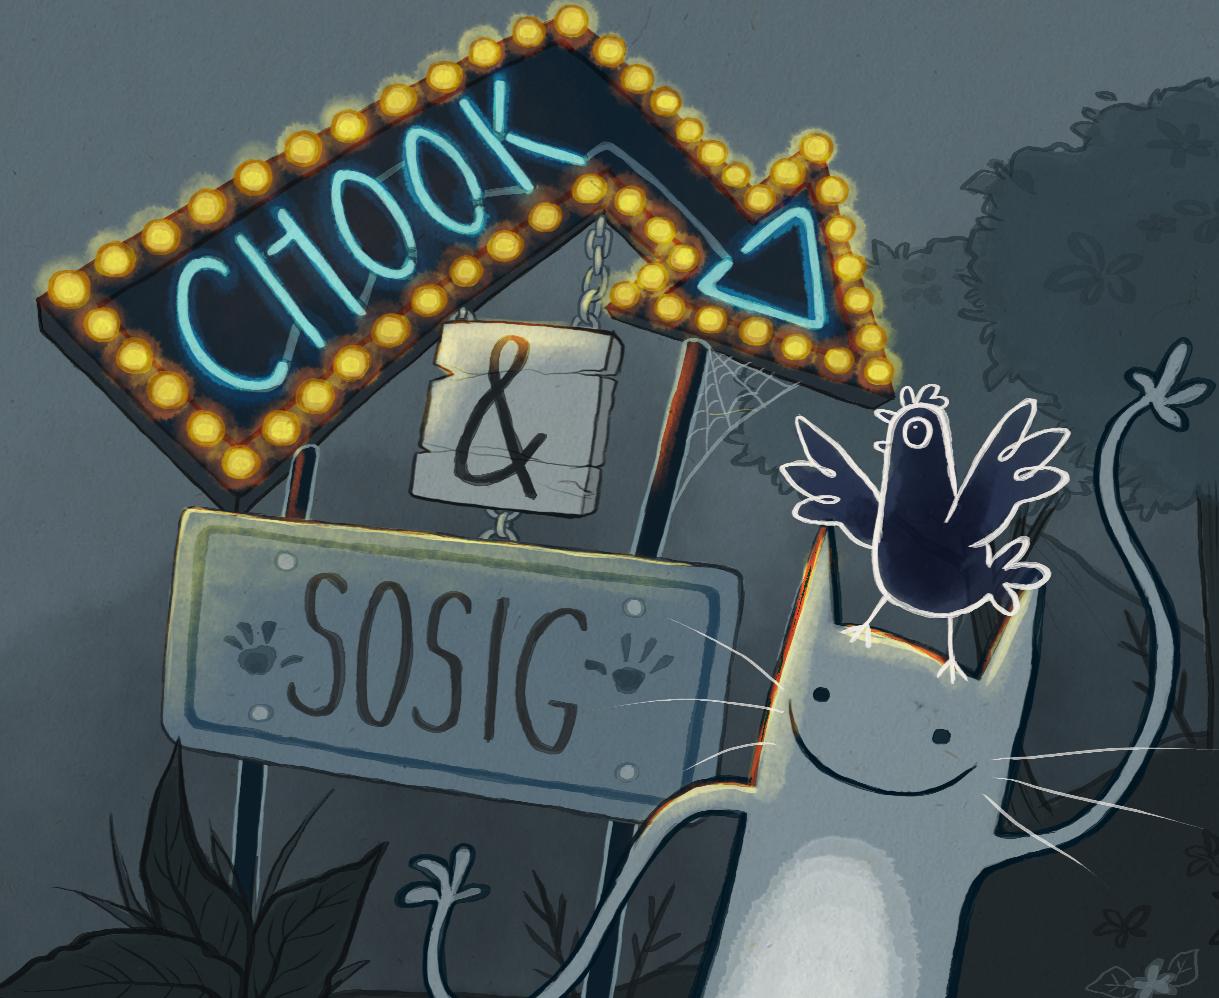 Chook & Sosig